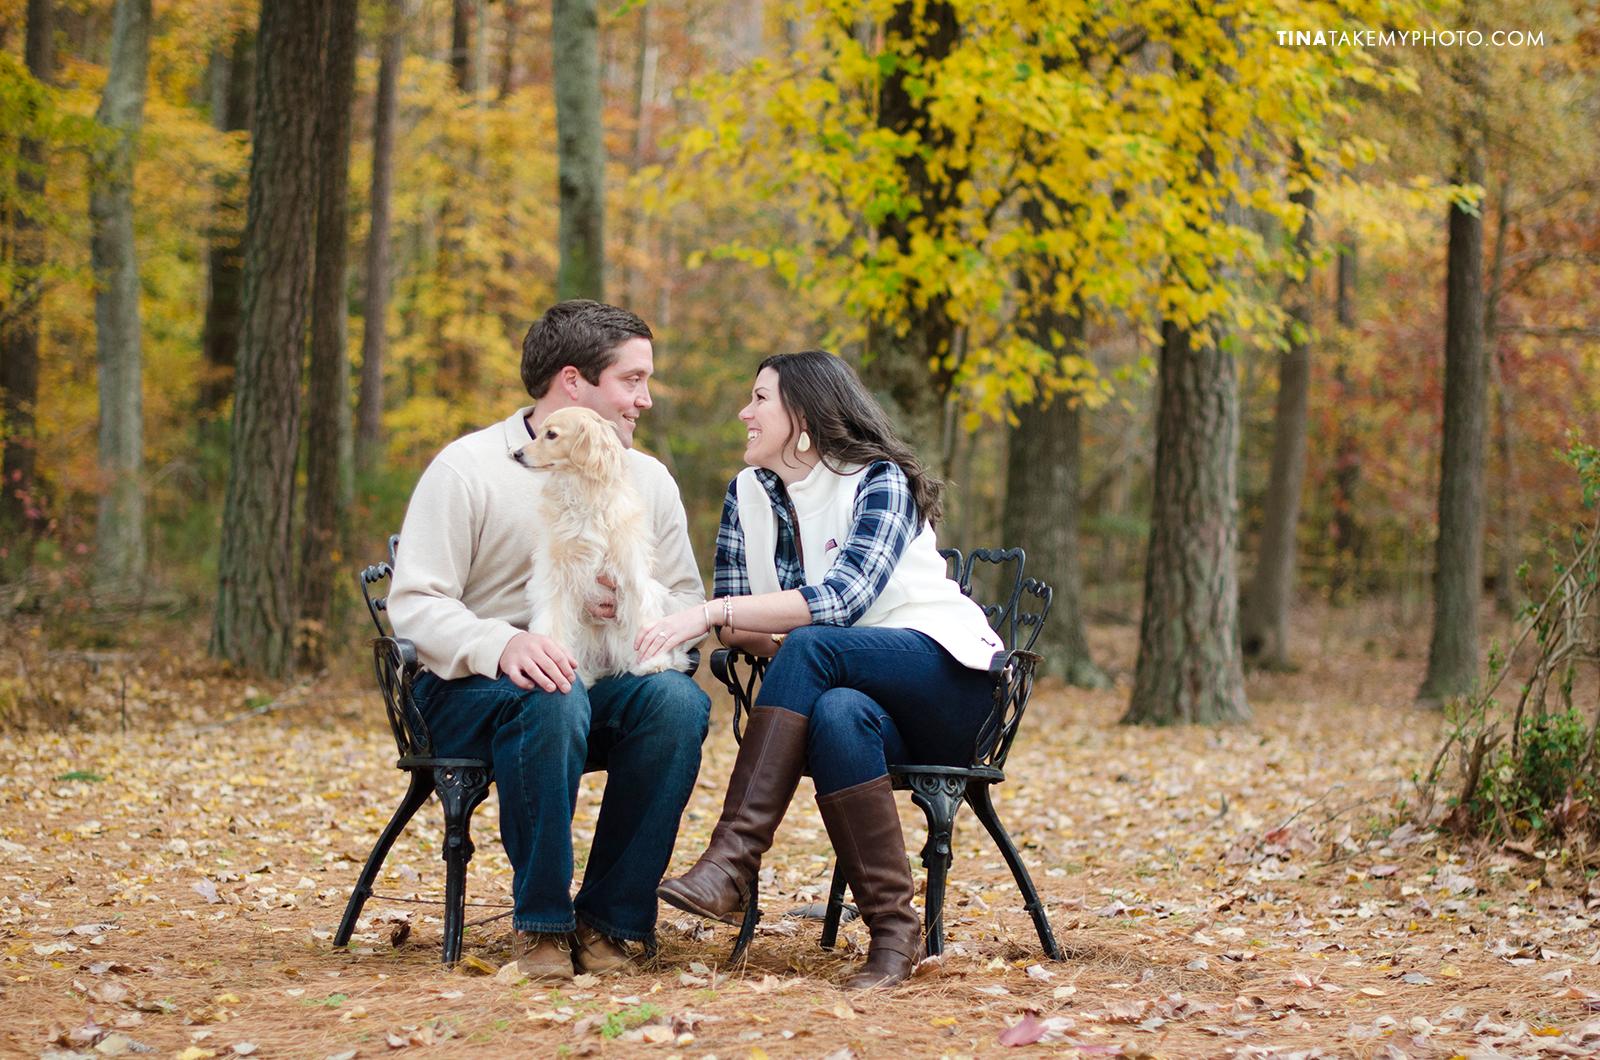 Modlothian-VA-Fall-Engagement-Photographer-Woods-Dog-Chairs